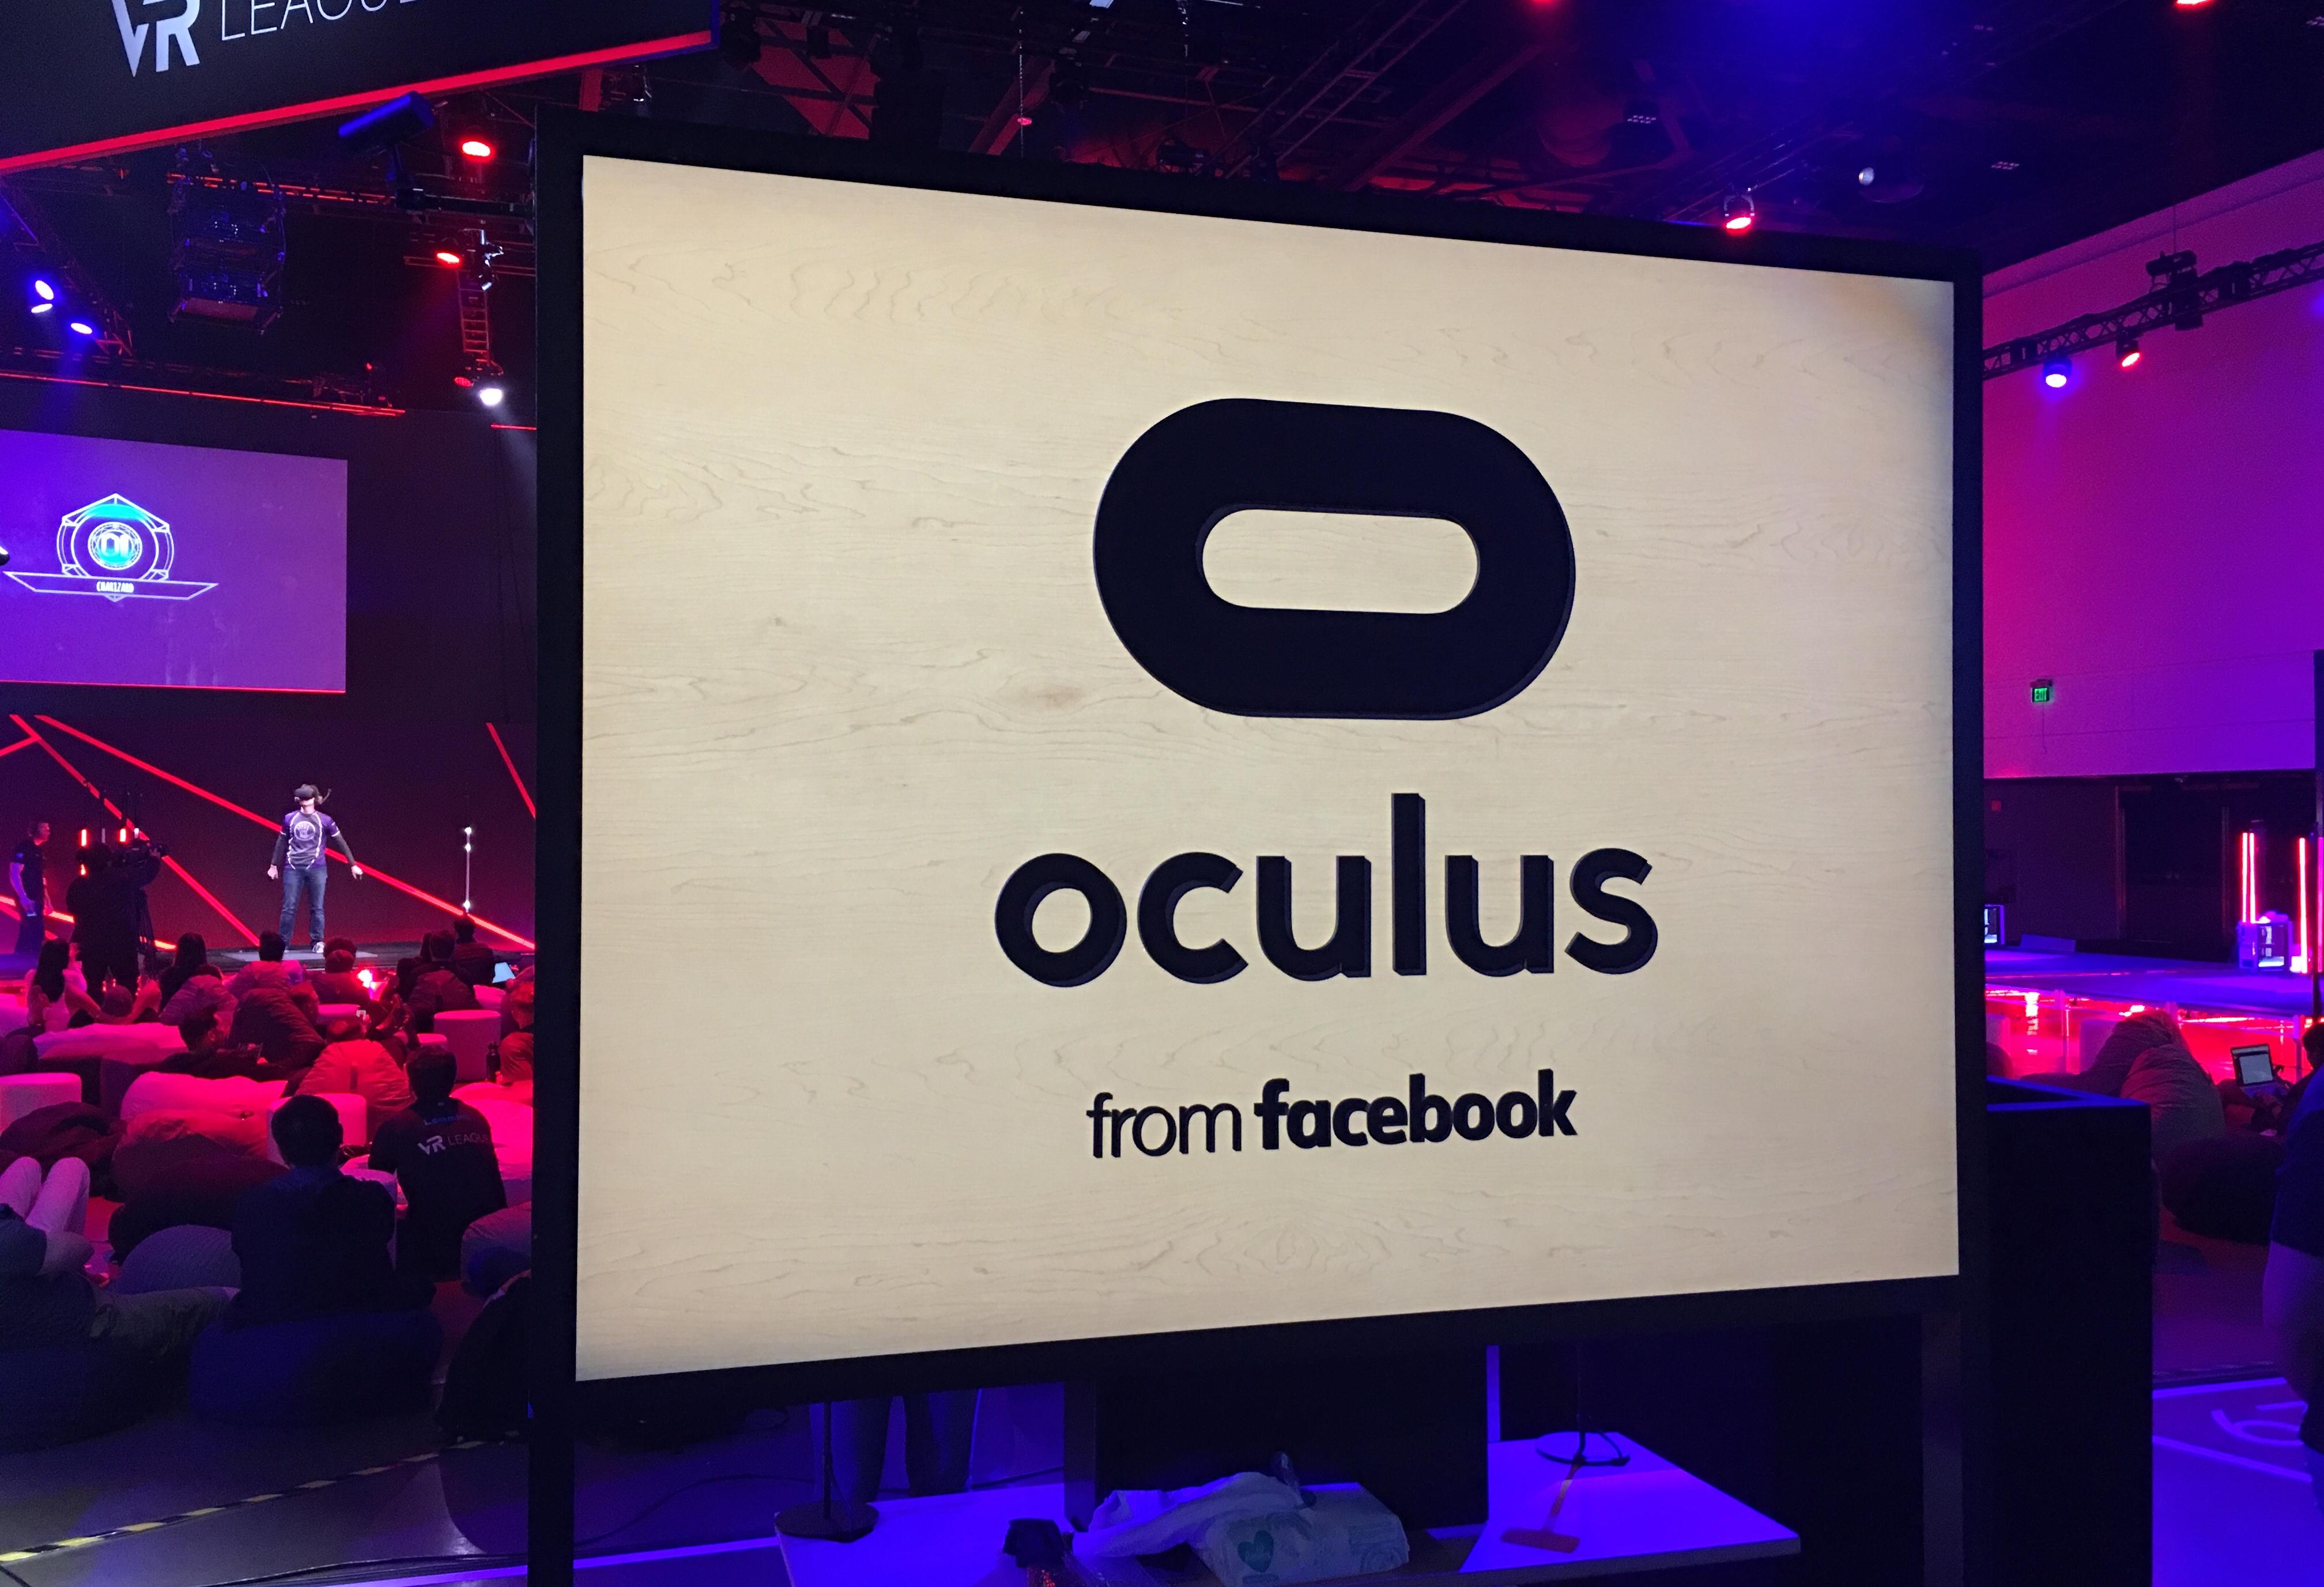 After canceling 'Rift 2' overhaul, Oculus plans a modest update to